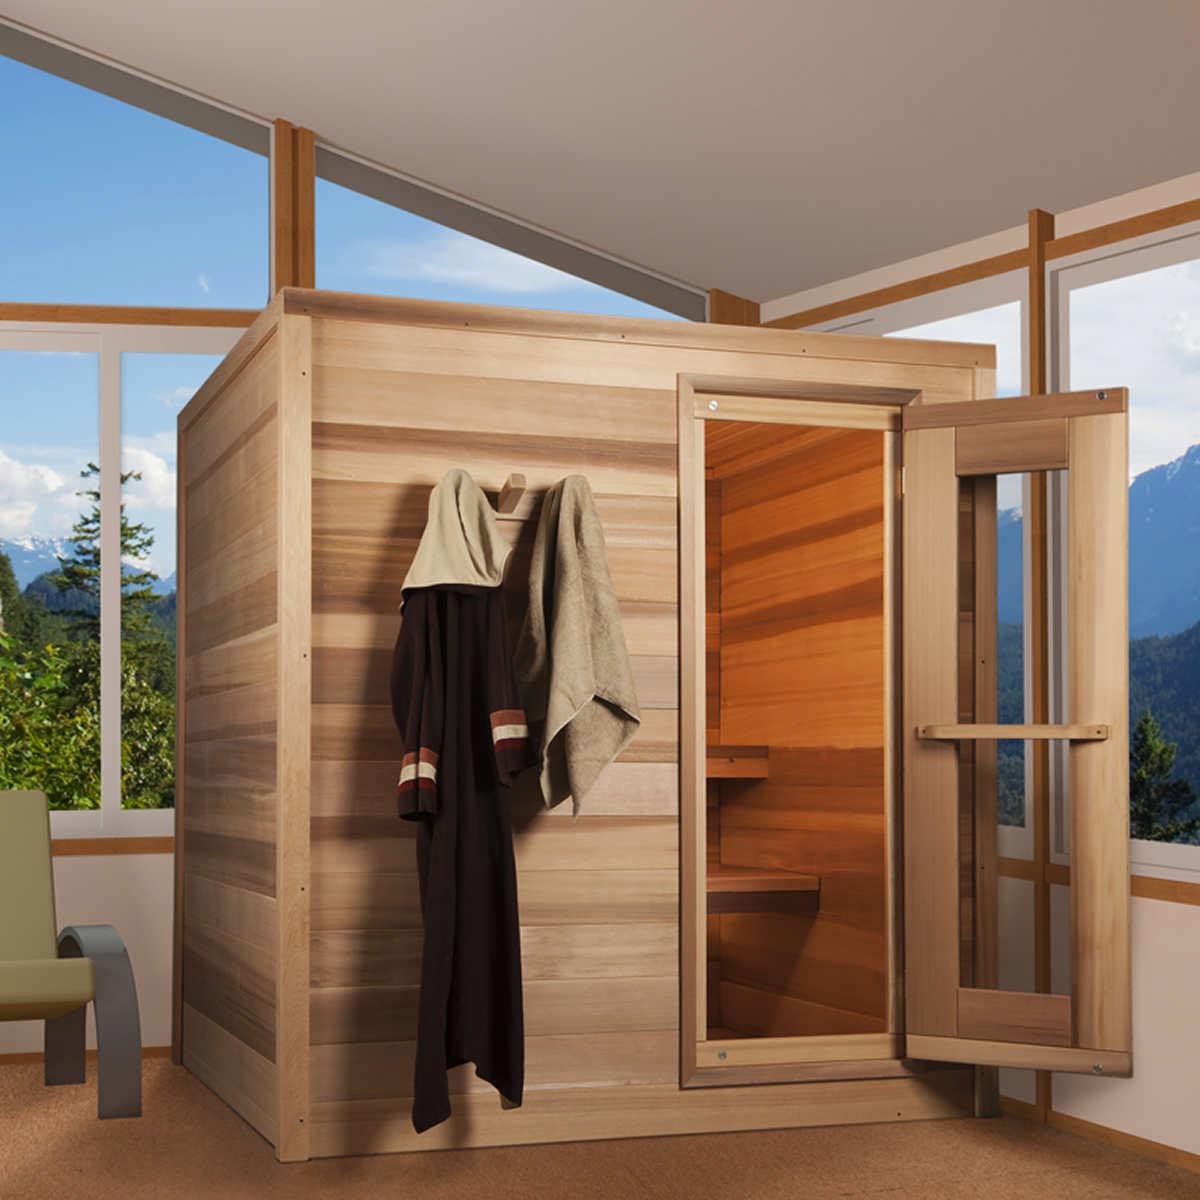 dundalk 6 person western red cedar barrel sauna with porch